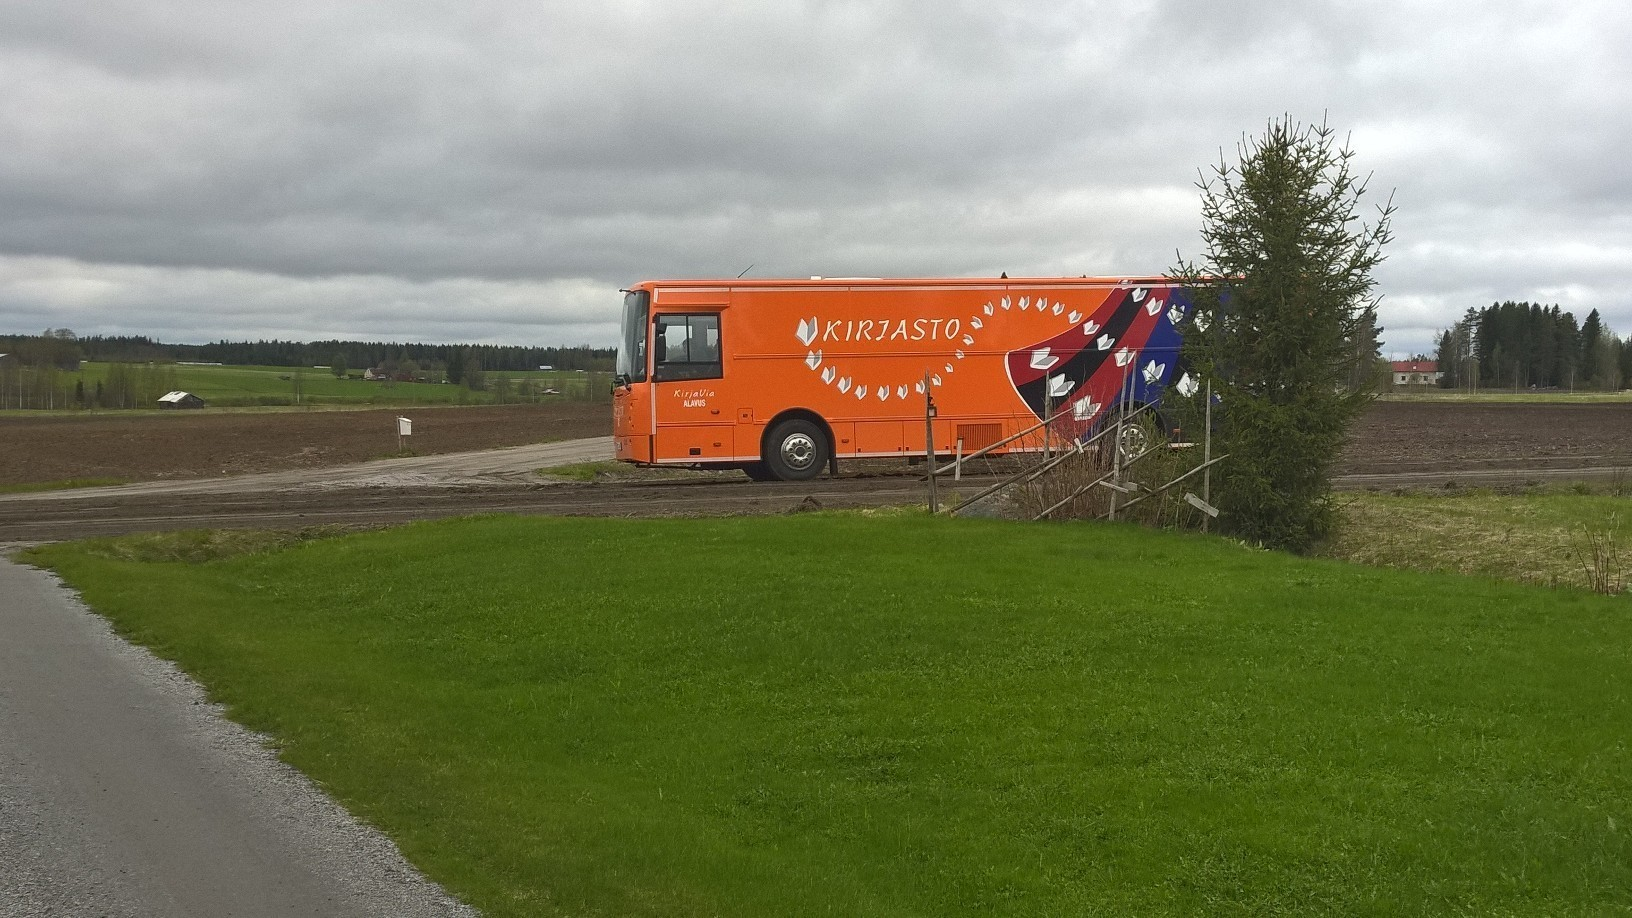 Mobile library KirjaVia (Alavus)